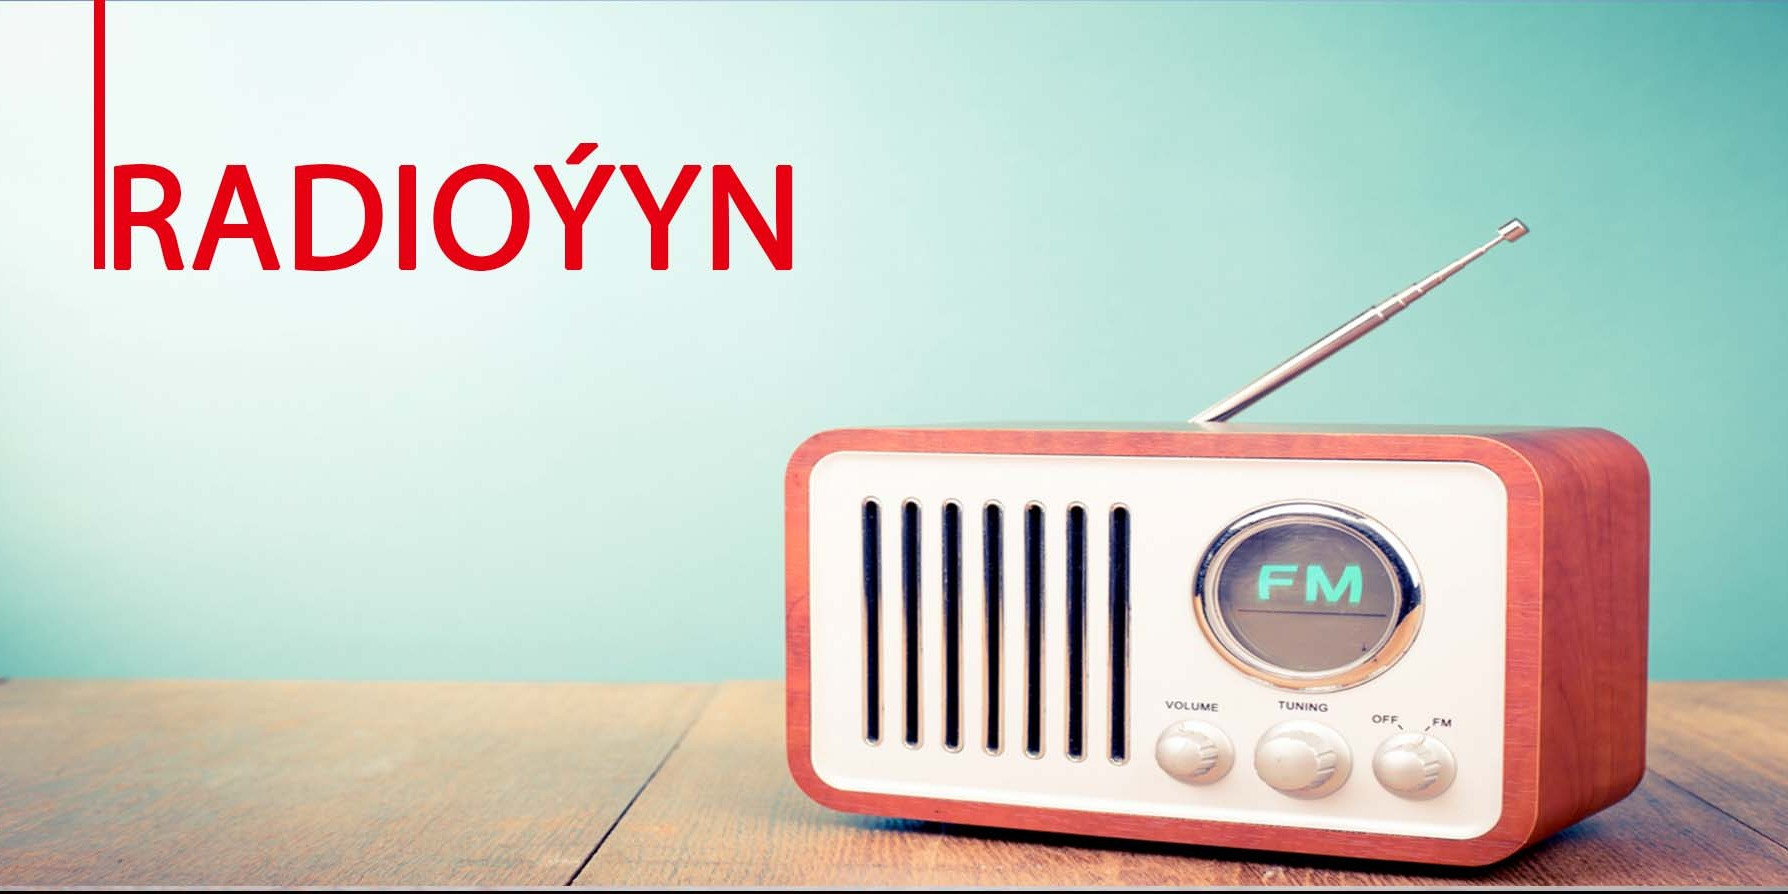 radiooyun, radiooyun, miras radio, watan radio, çar tarapdan radio, turkmen radio, bally molla, #, #radio, #turkmen radiosy, #turkmen